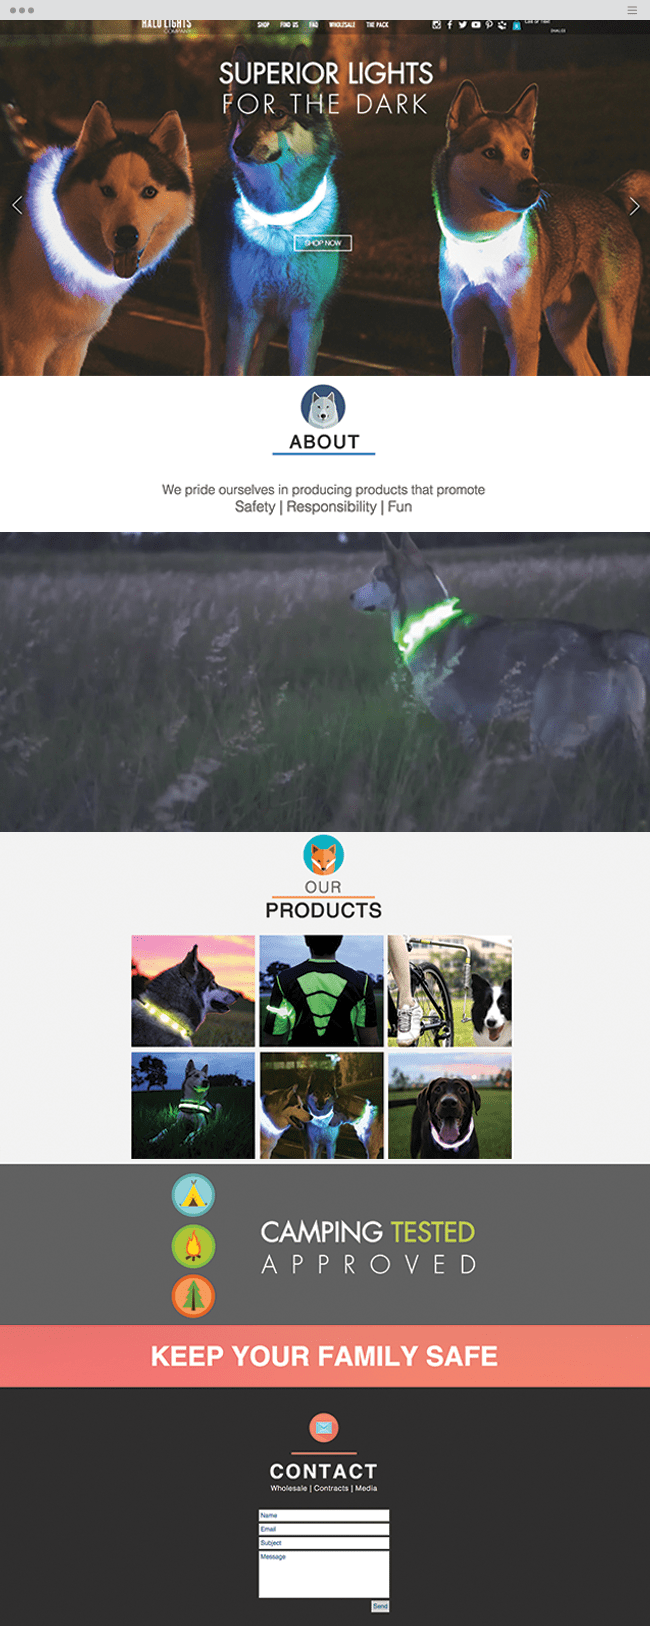 Halo Lights Company